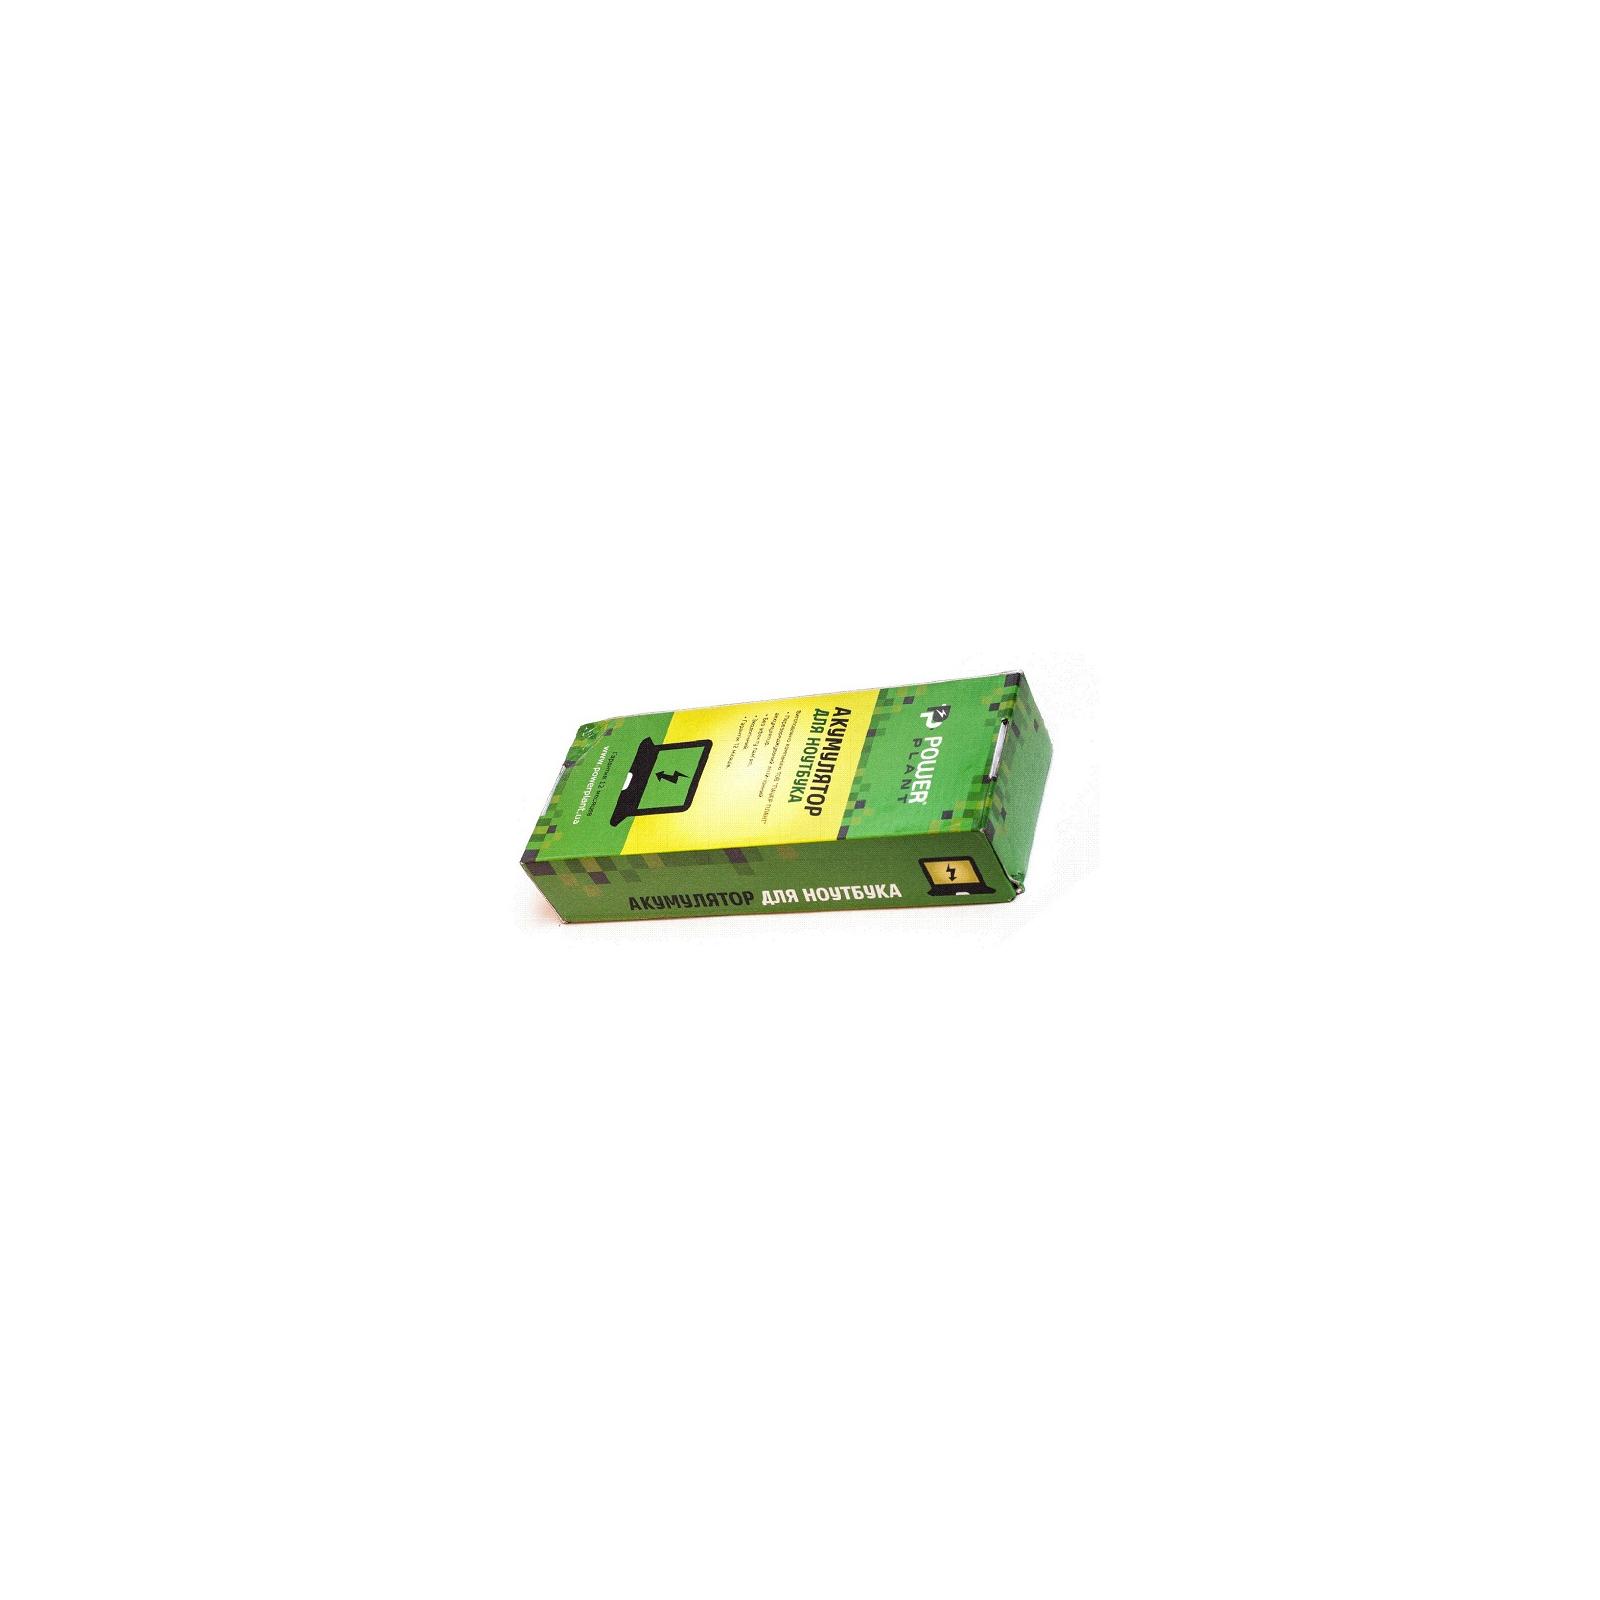 Аккумулятор для ноутбука HP Presario 2100 (H NC6120 3S2P HSTNN-UB08) 10.8V 5200mAh PowerPlant (NB00000020) изображение 3